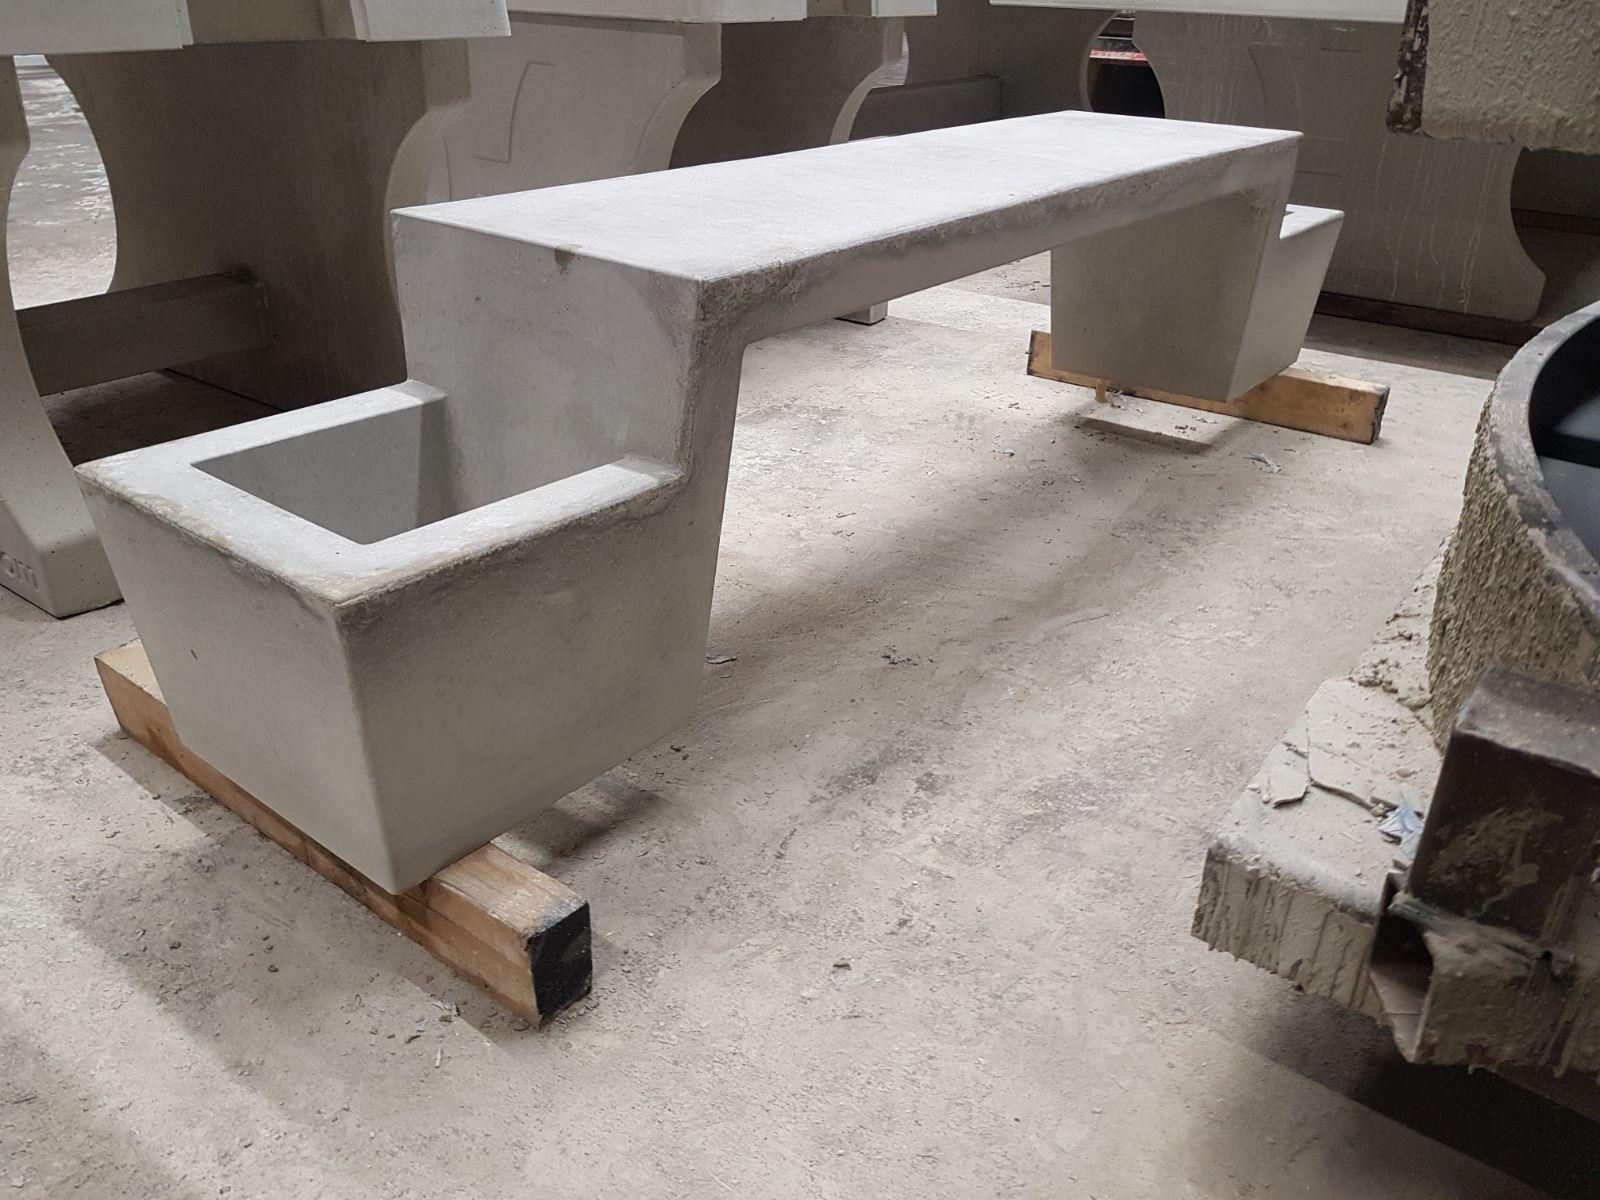 IMG-20170327-WA0015 bankje in beton